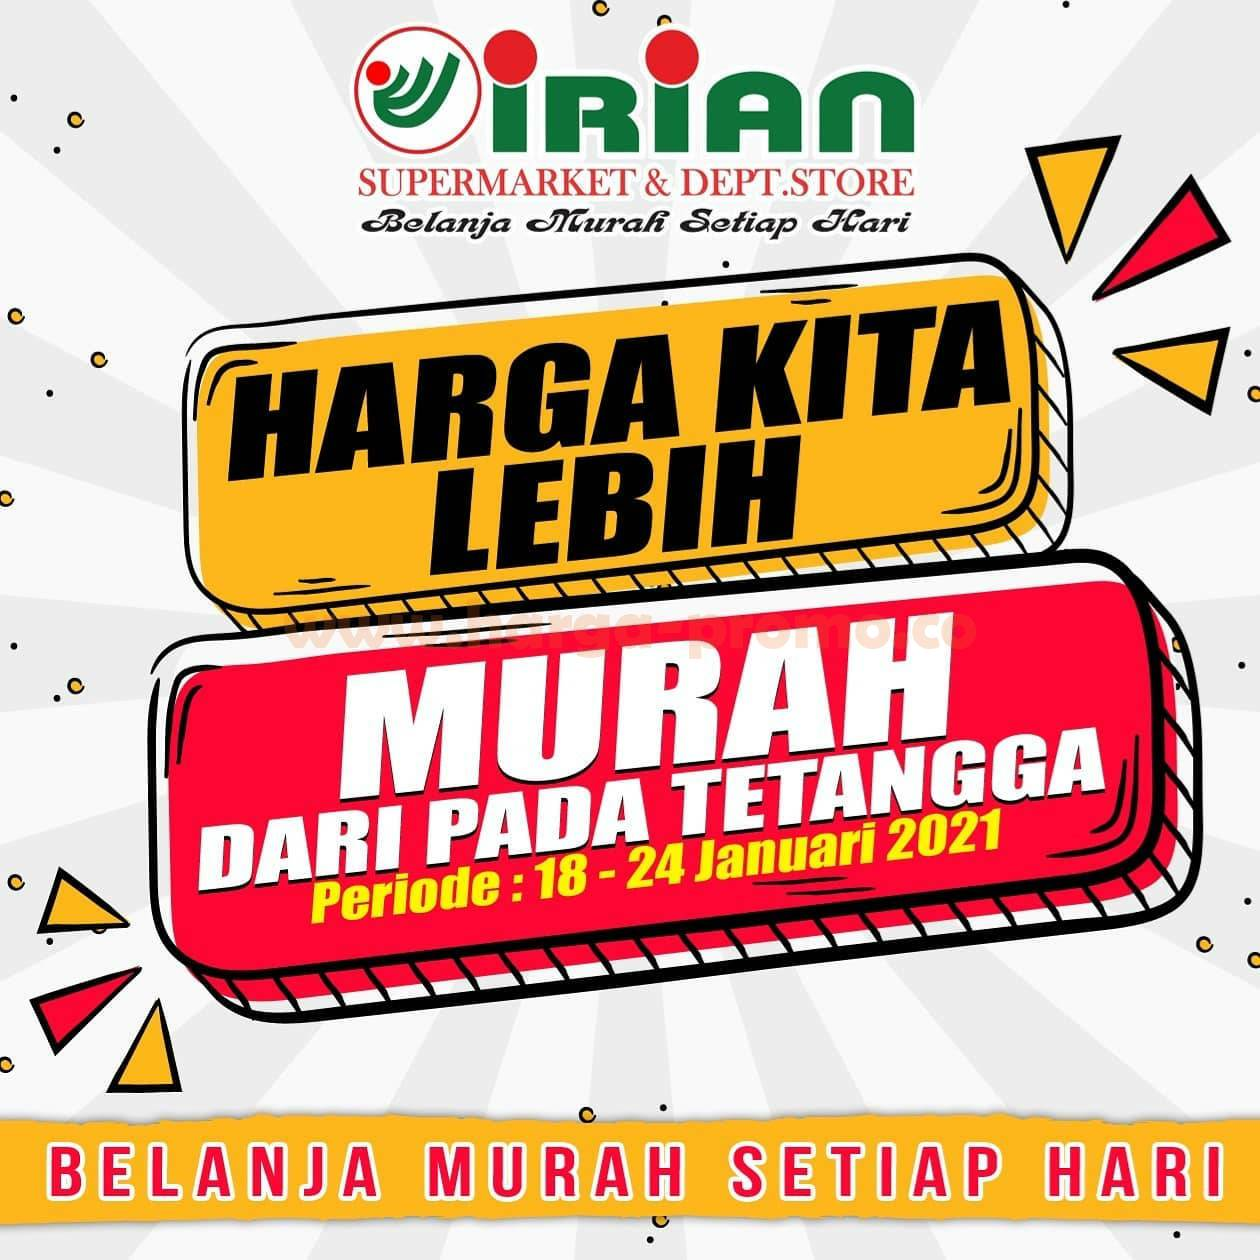 Katalog Promo IRIAN Supermarket 18 - 24 Januari 2021